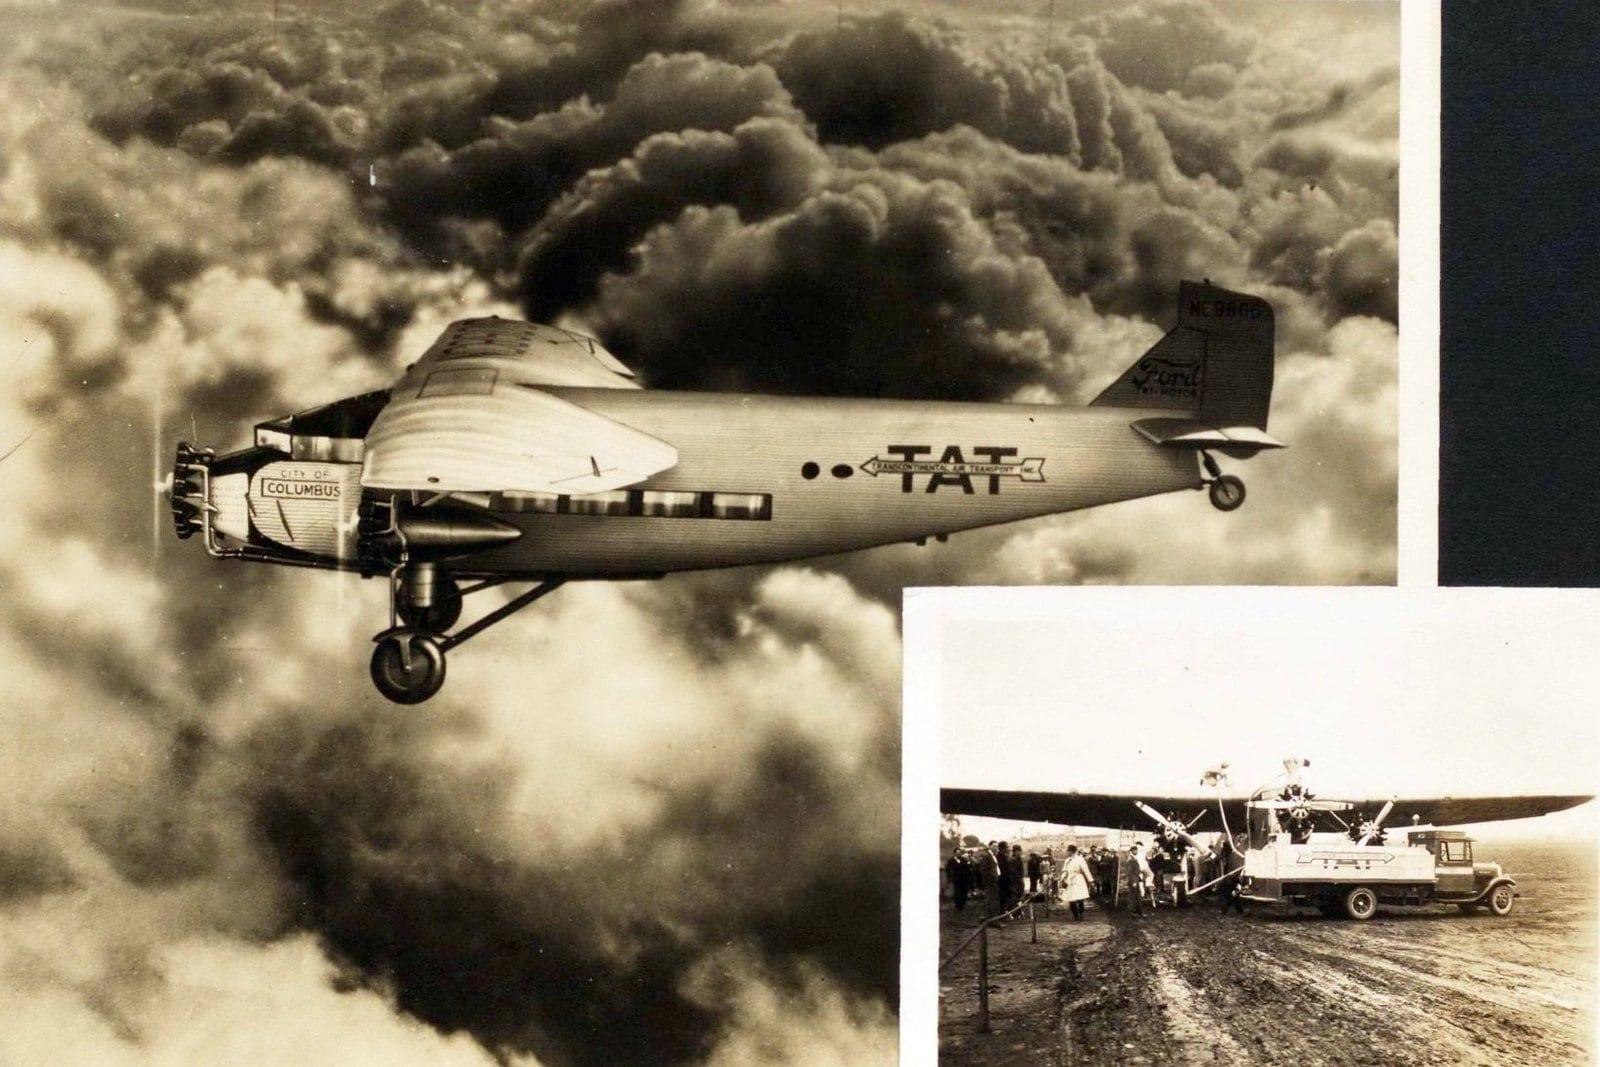 Photo of Transcontinental Air Transport (TAT) plane courtesy Smithsonian NASM